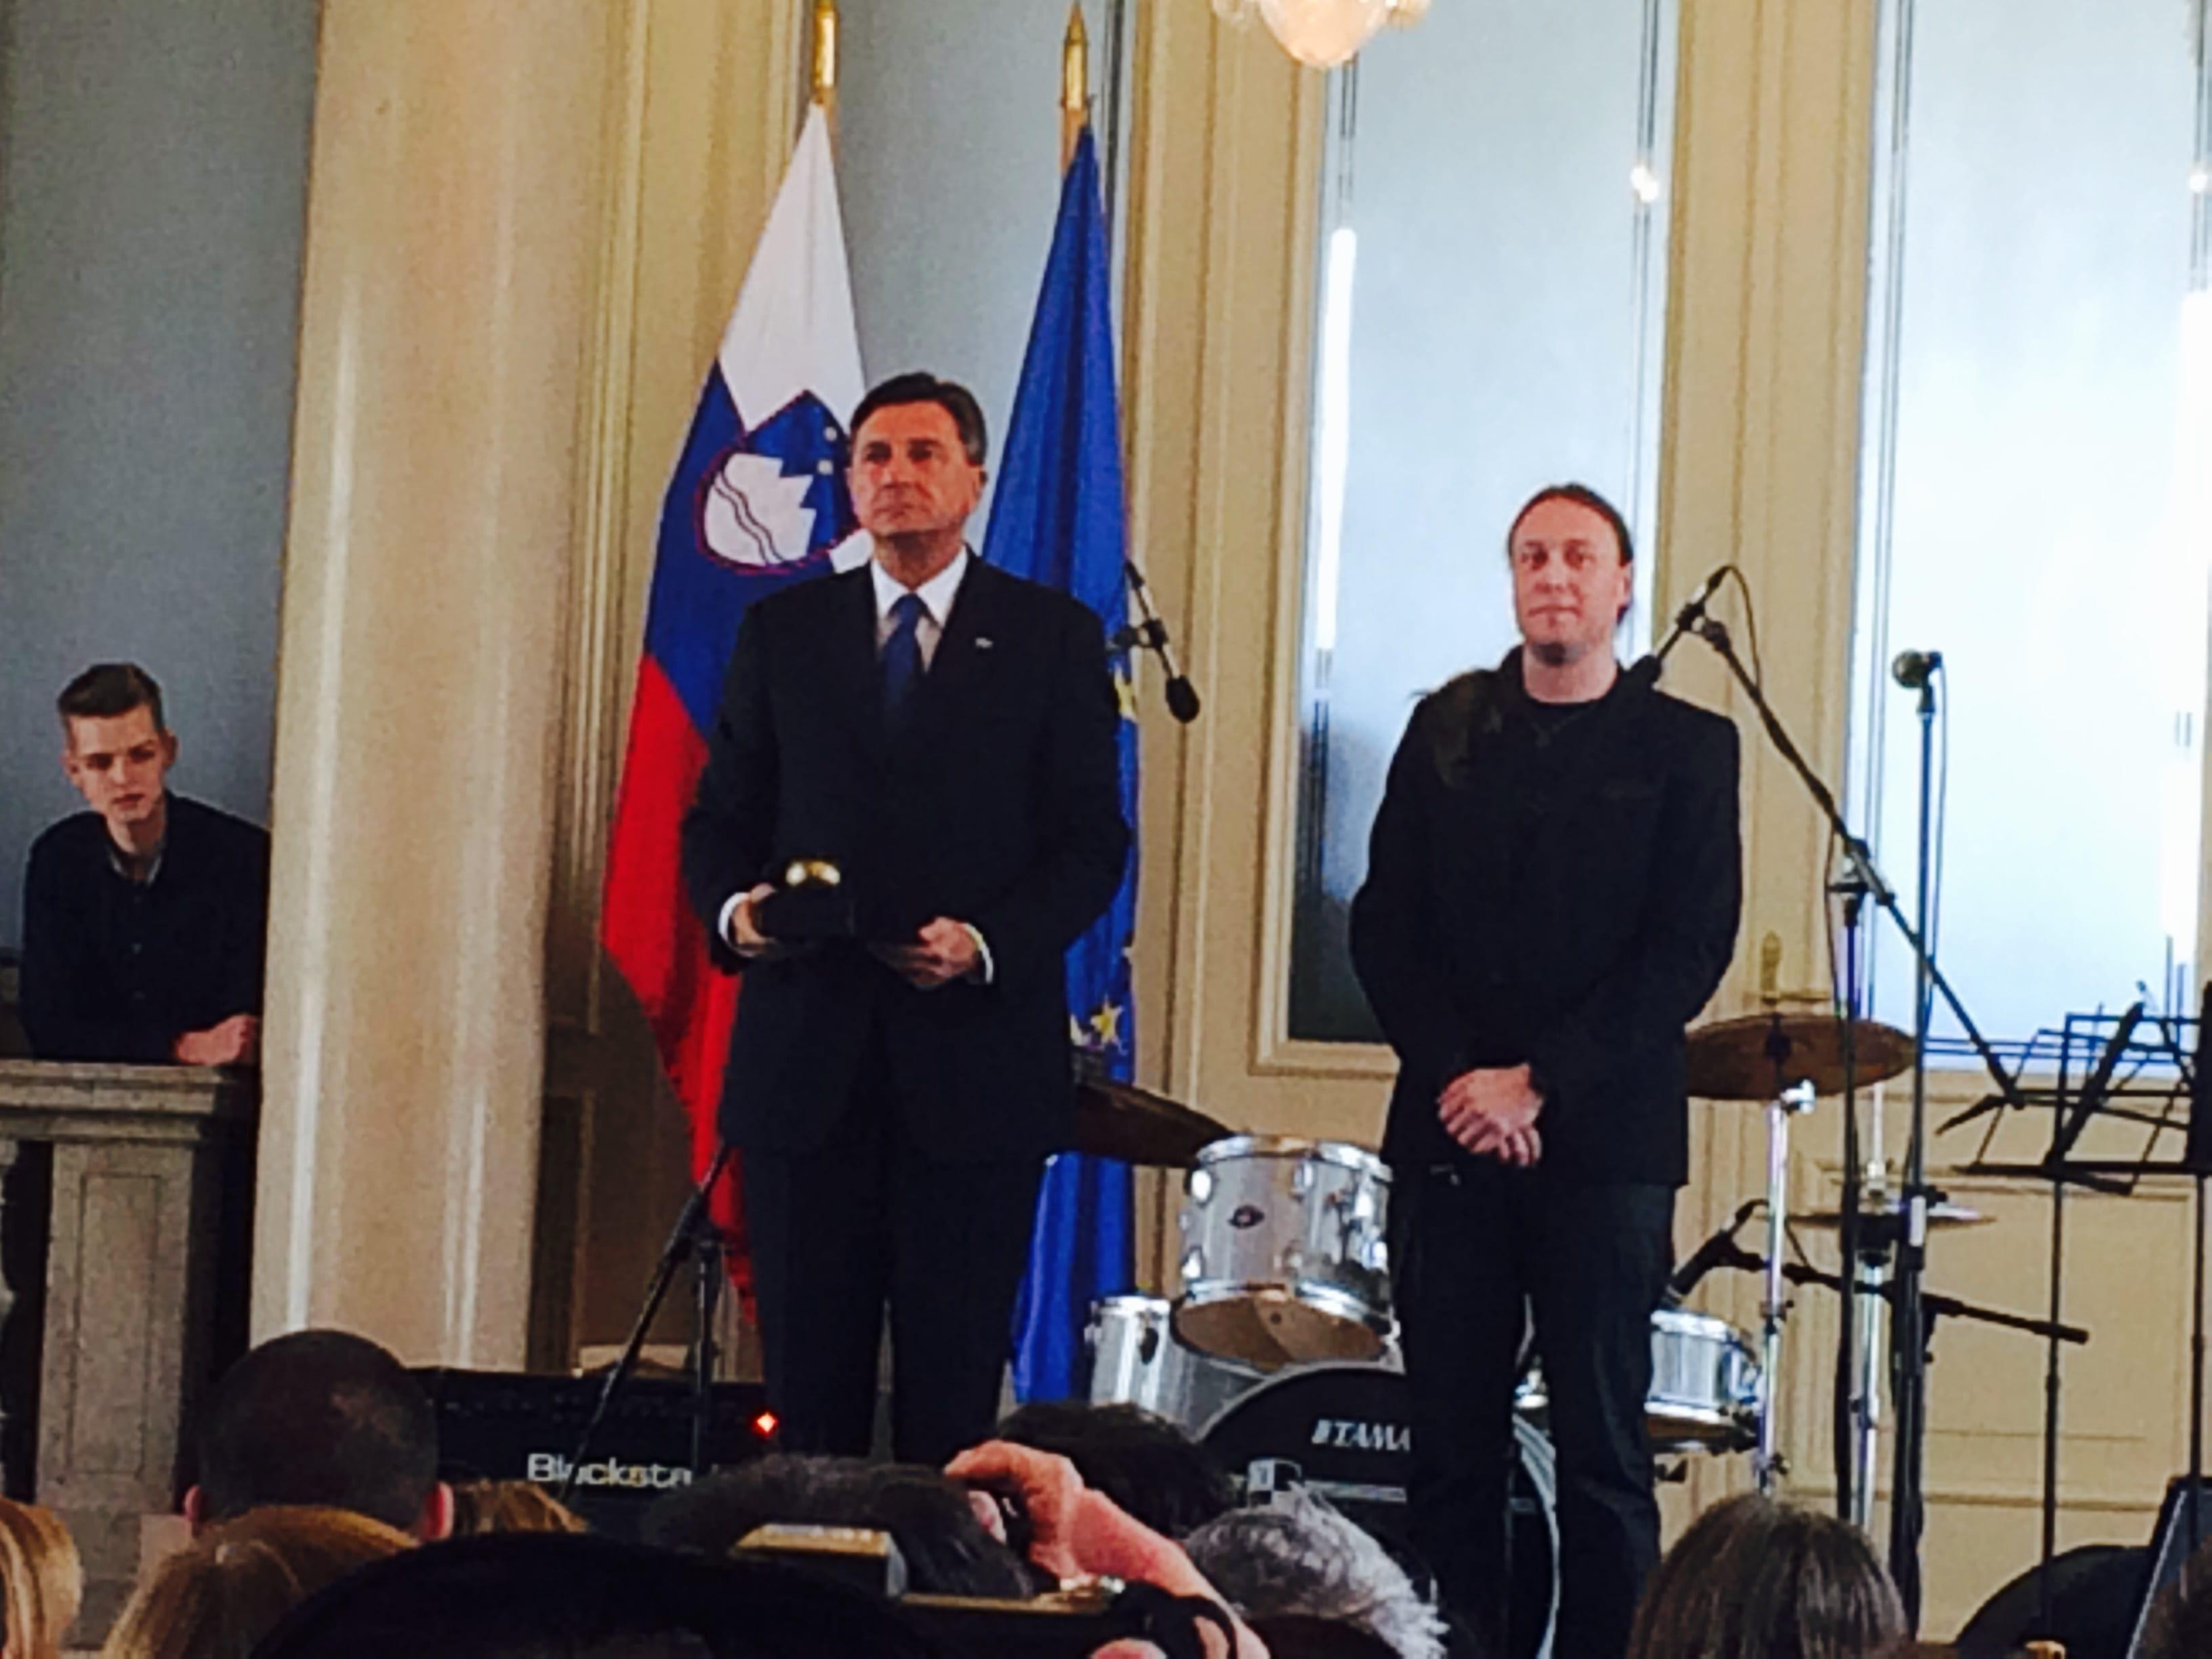 Marko Soršak in Borut Pahor